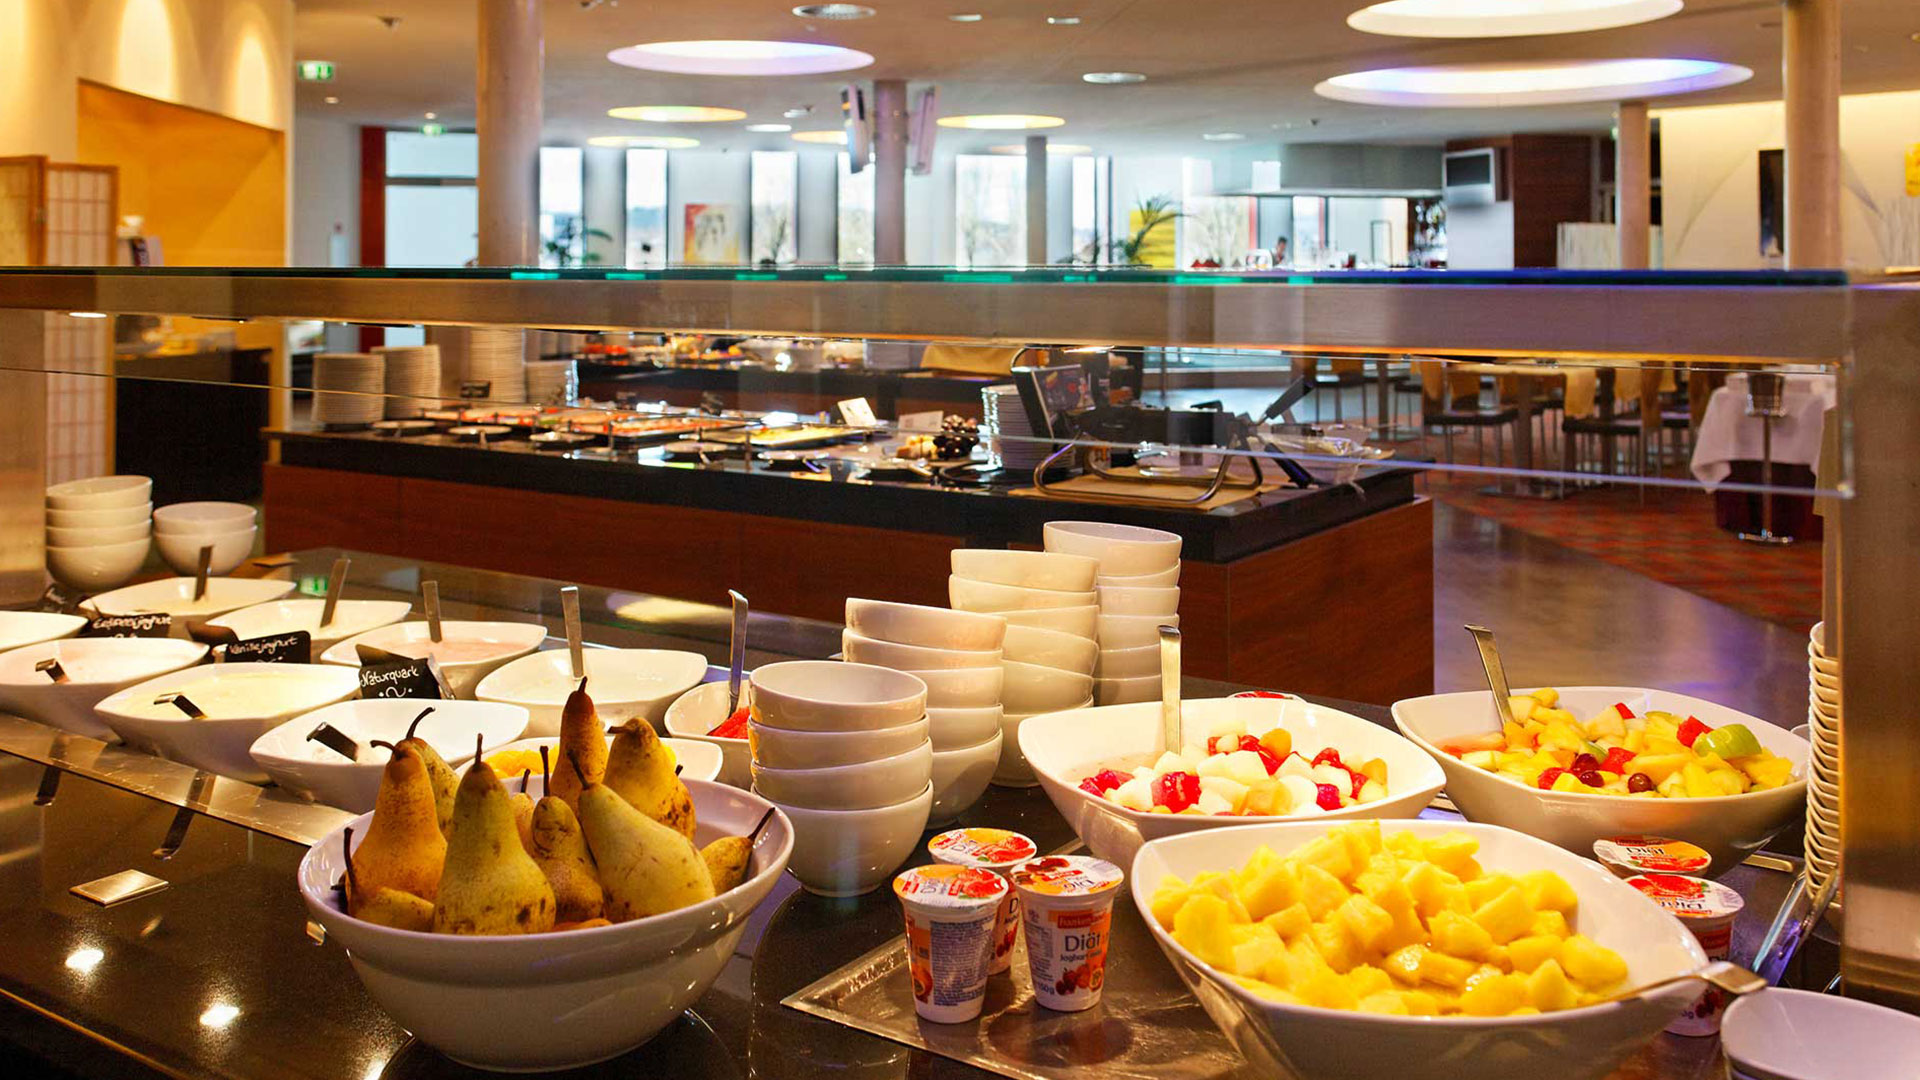 Photo du petit déjeuner - Hilton Garden Inn Stuttgart NeckarPark